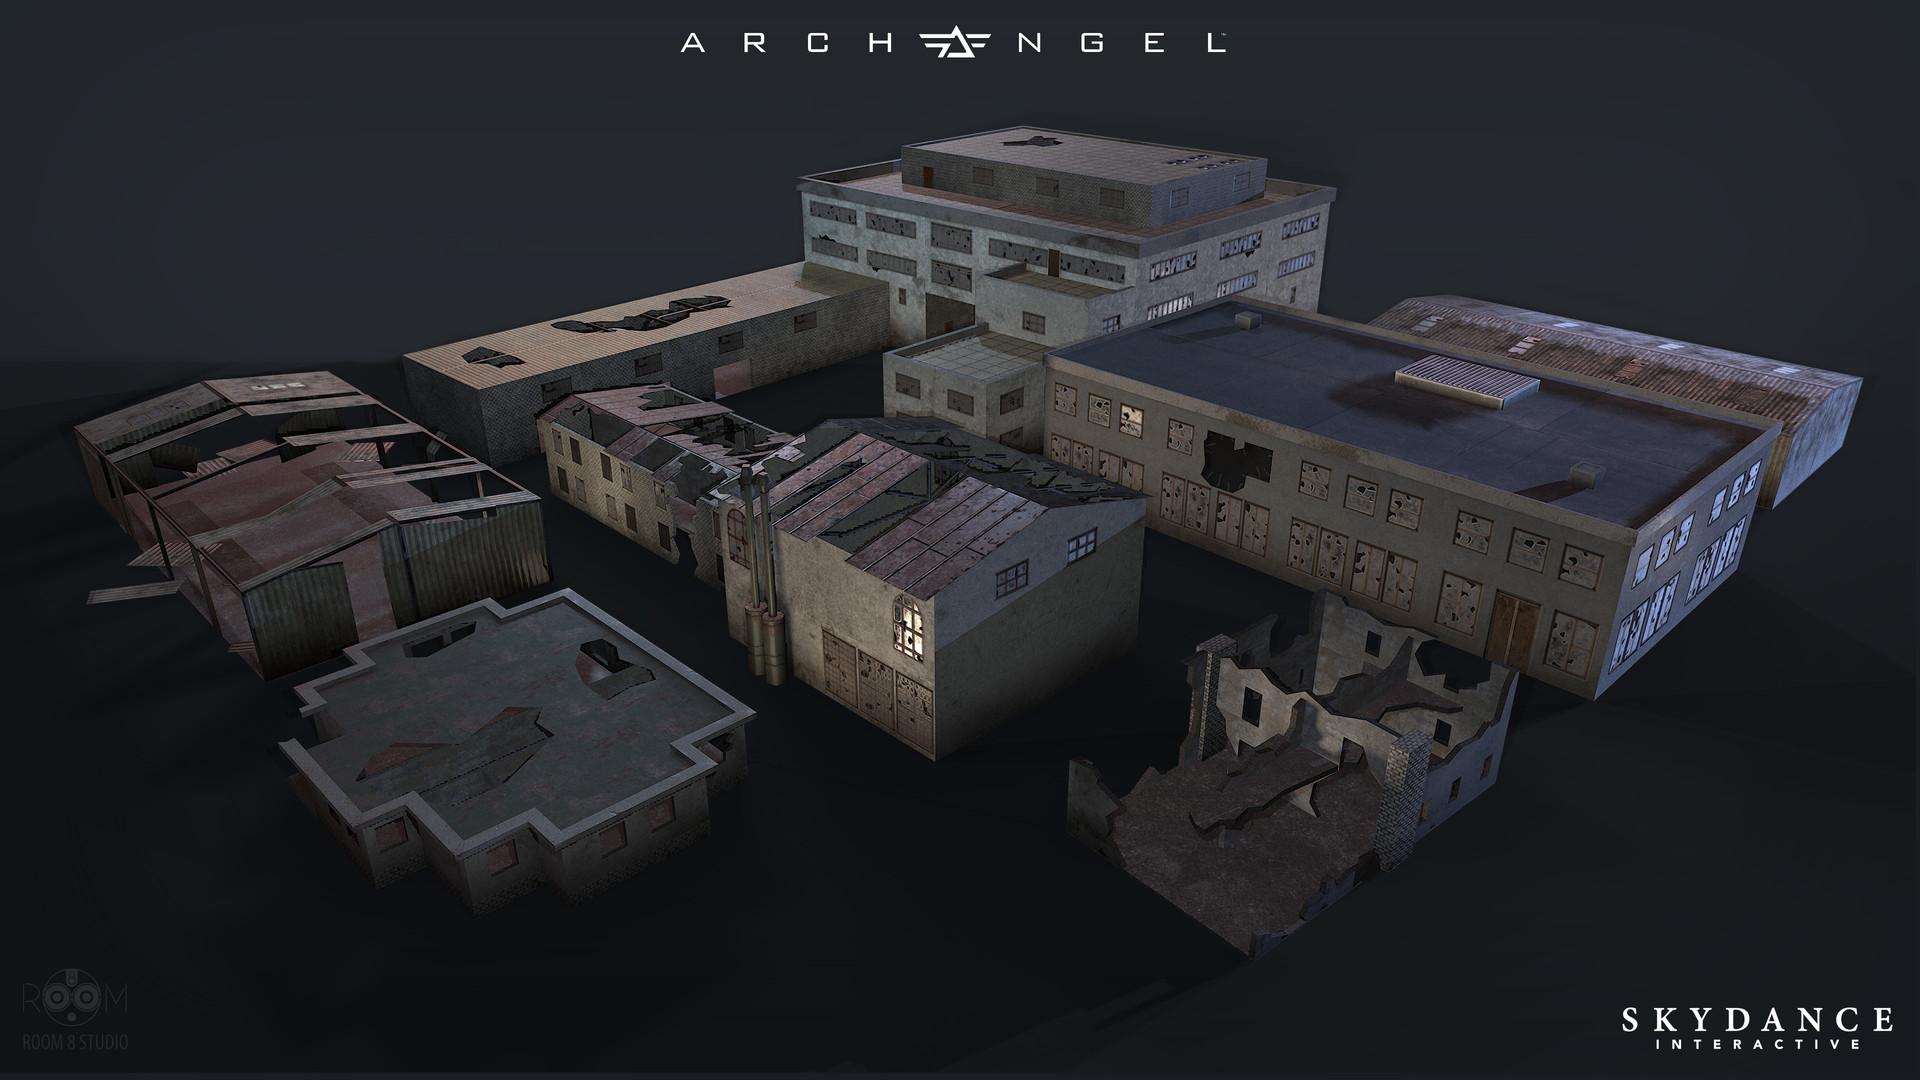 Room 8 studio warehouses destroyed